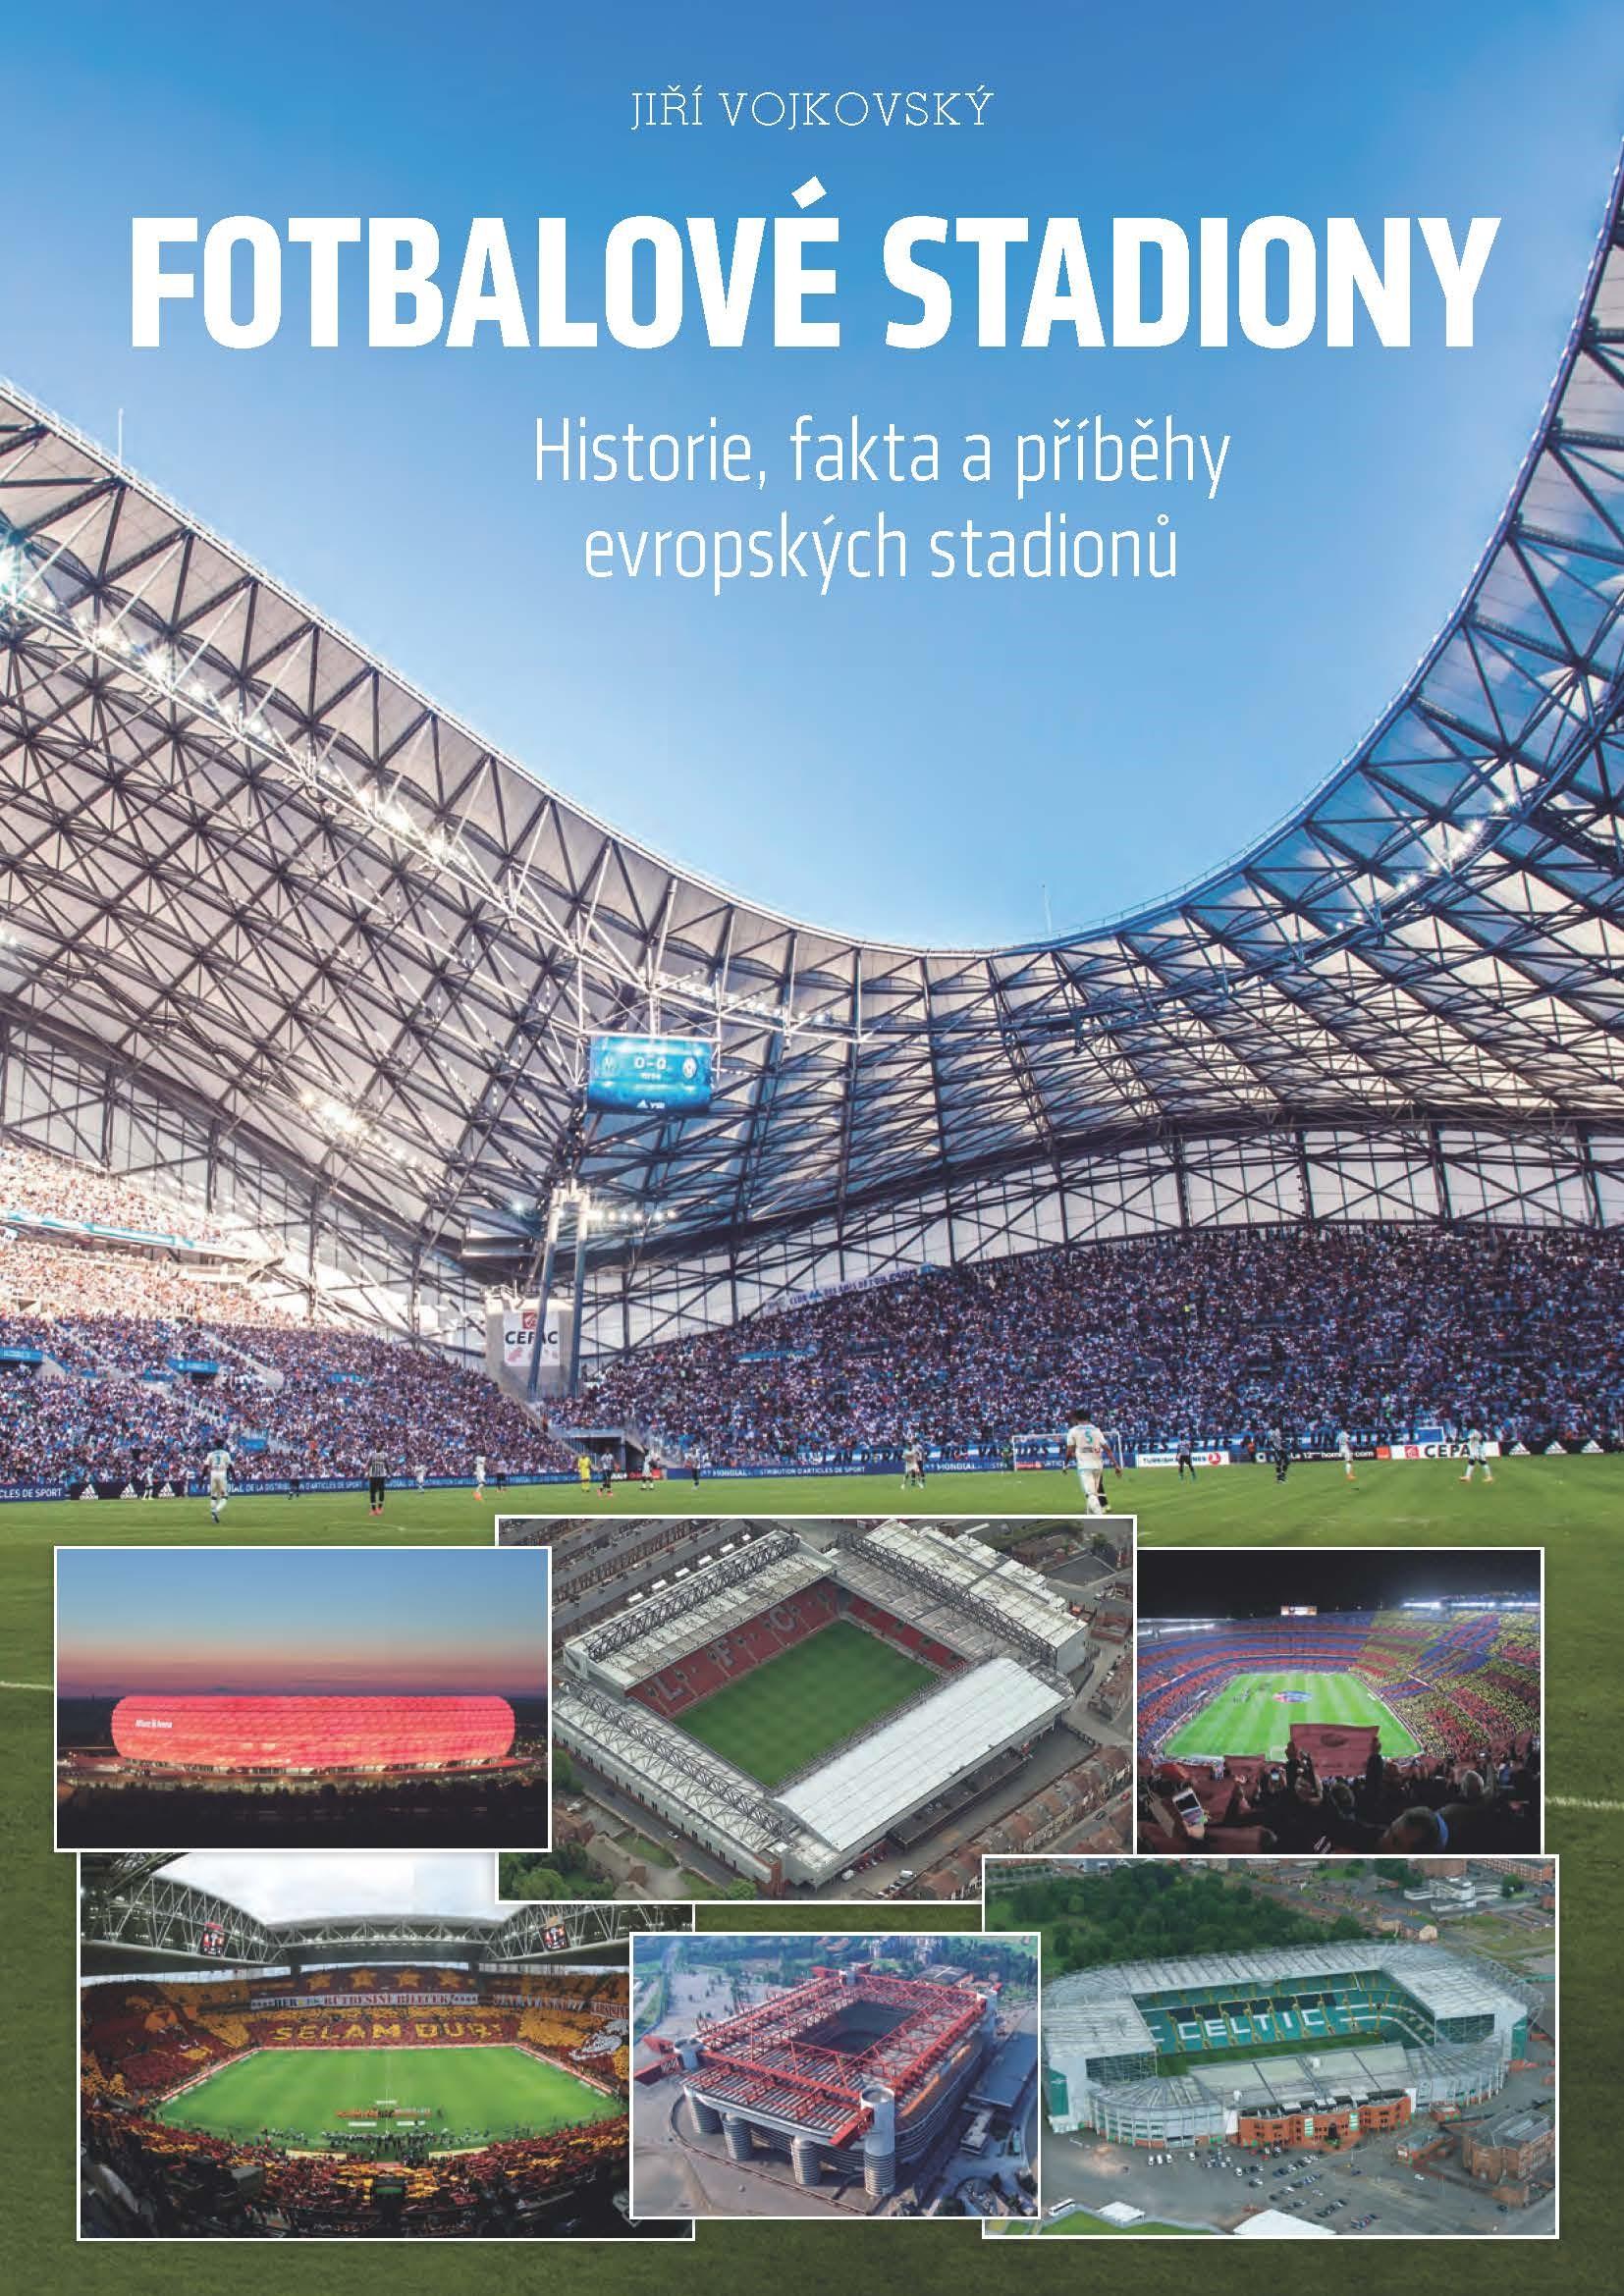 FOTBALOVÉ STADIONY - HISTORIE, FAKTA A P